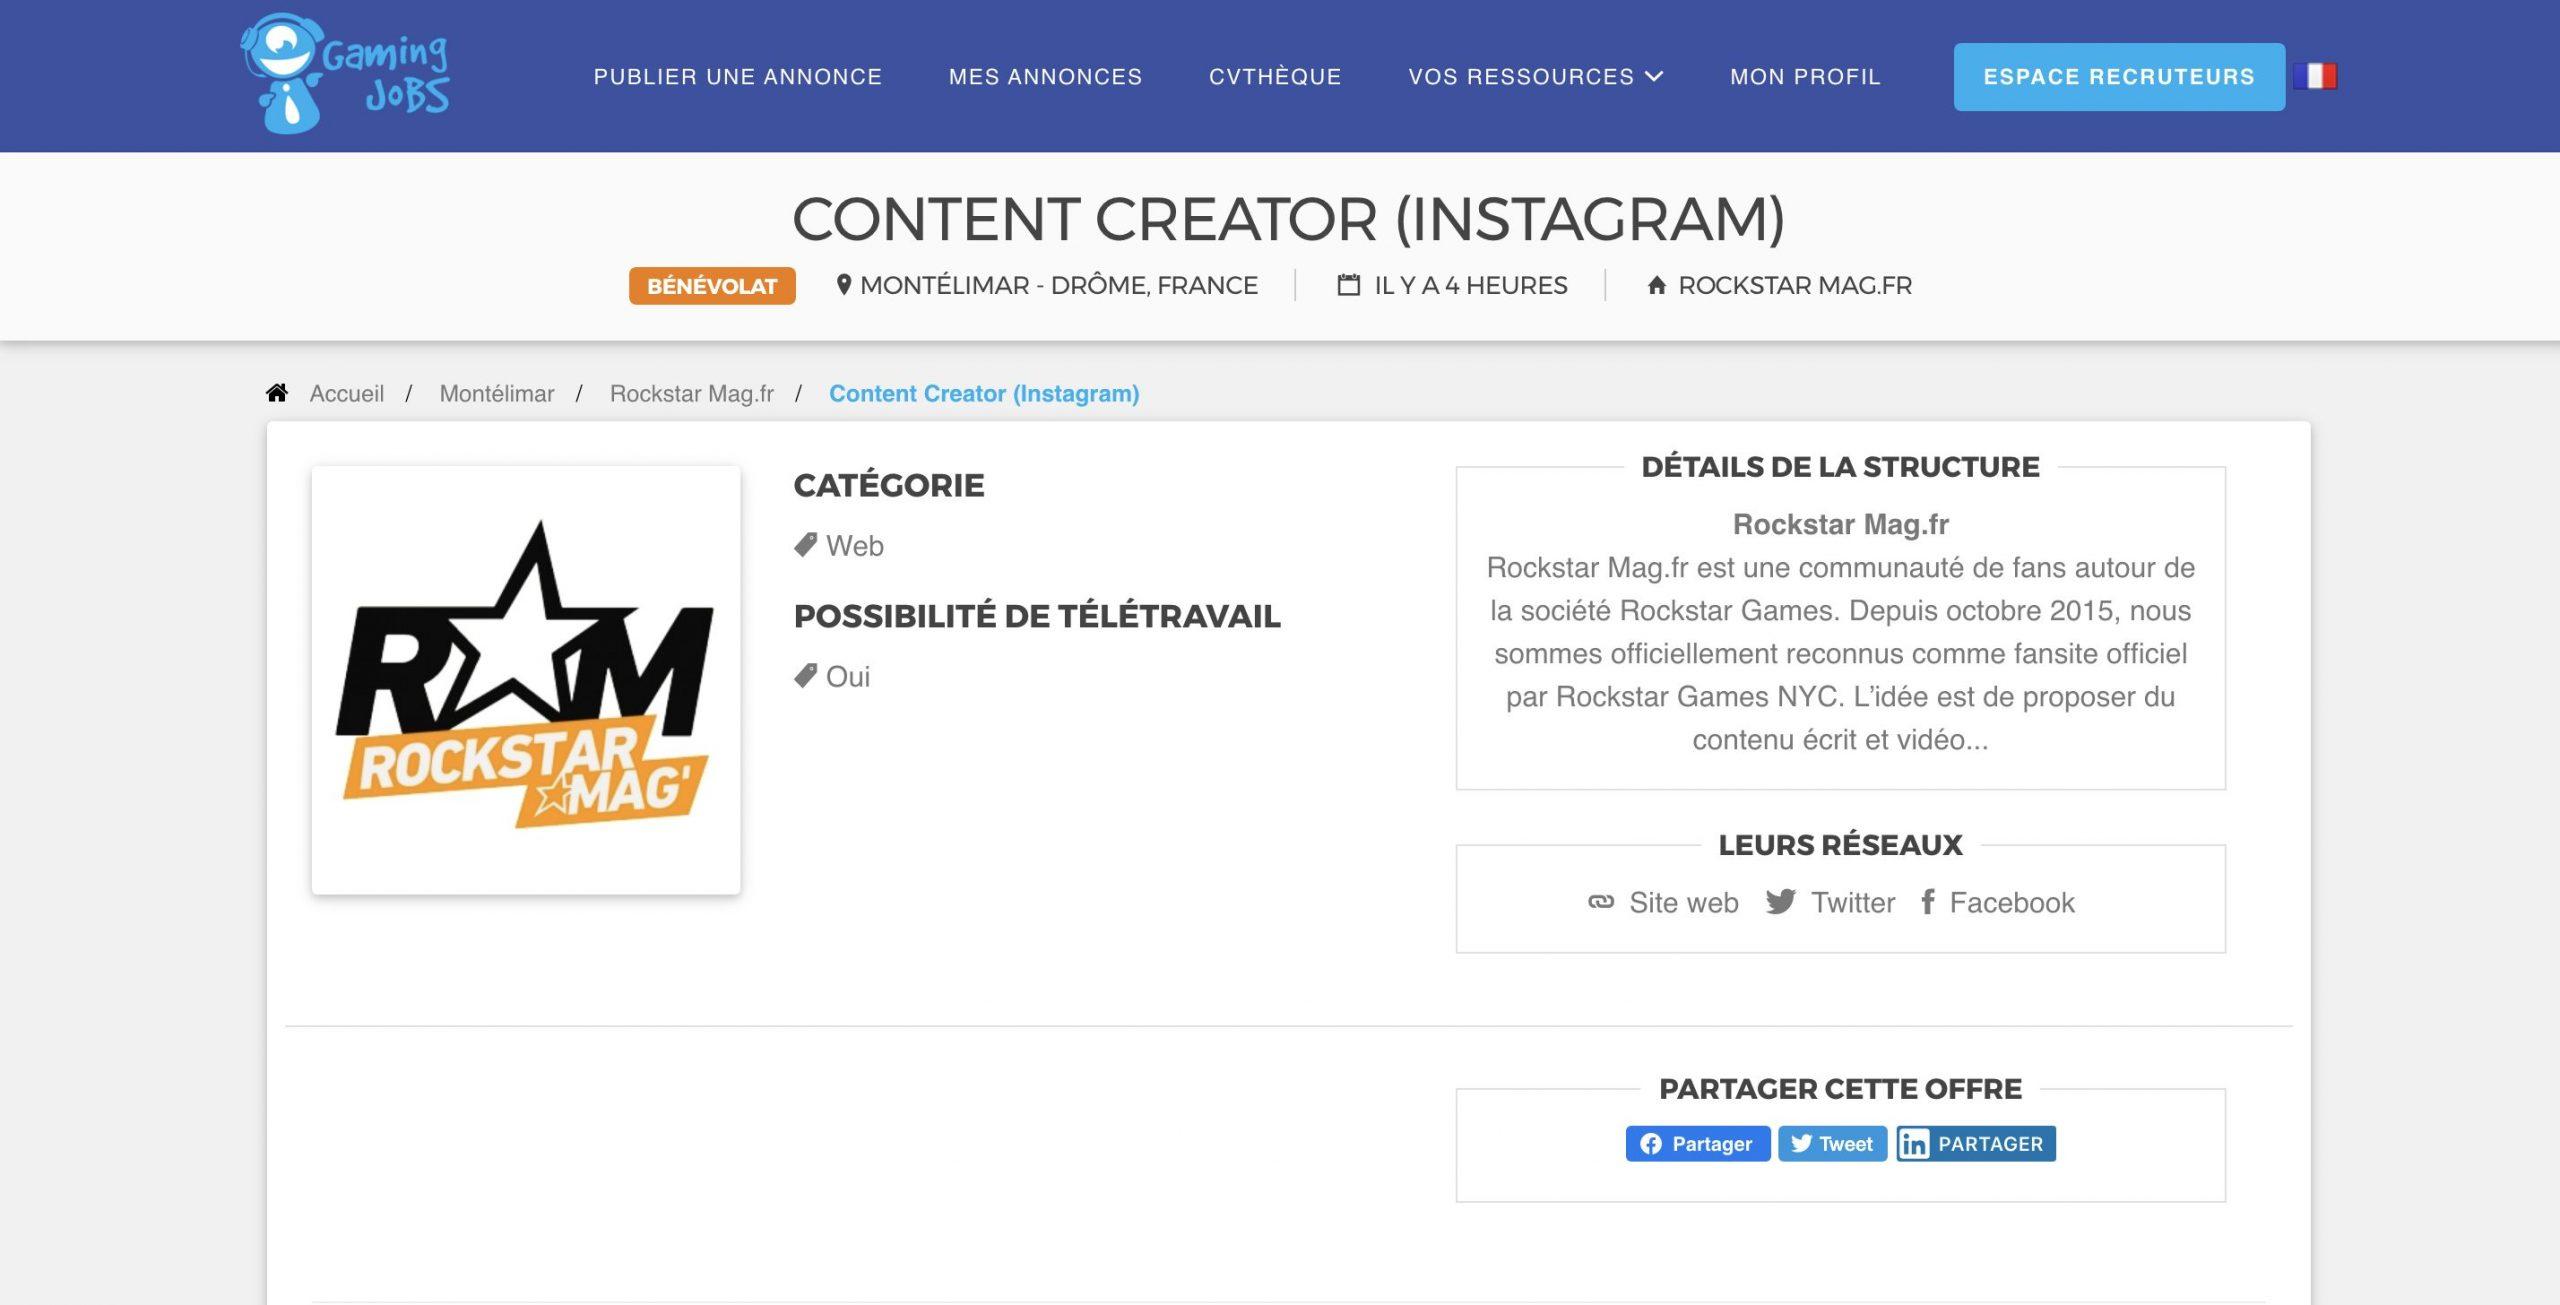 Offre Content Creator Rockstar Mag'